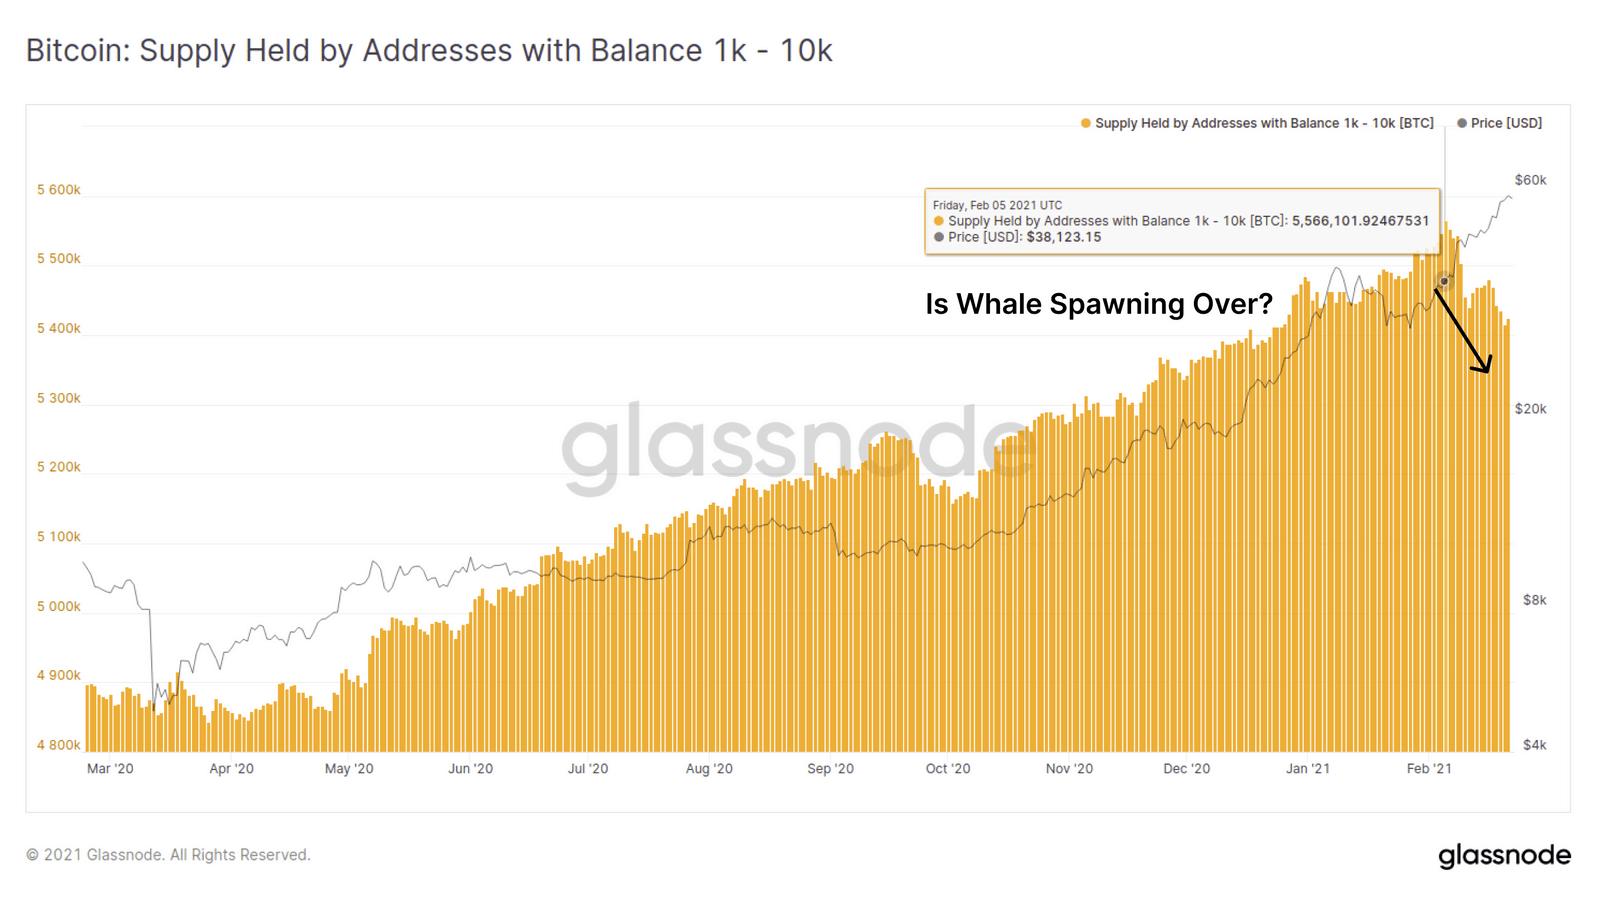 Bitcoin Whales Behavior 2020-2021. Source: Glassnode